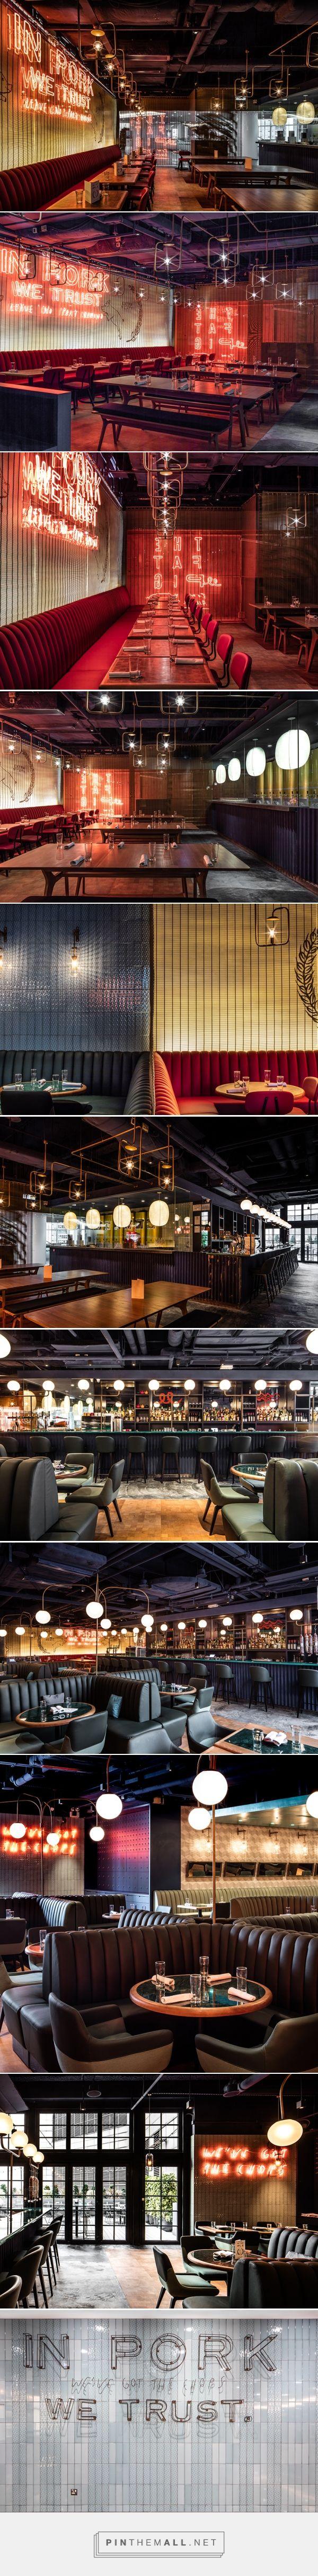 the fat pig restaurant in hong kong by michaelis boyd - created via https://pinthemall.net